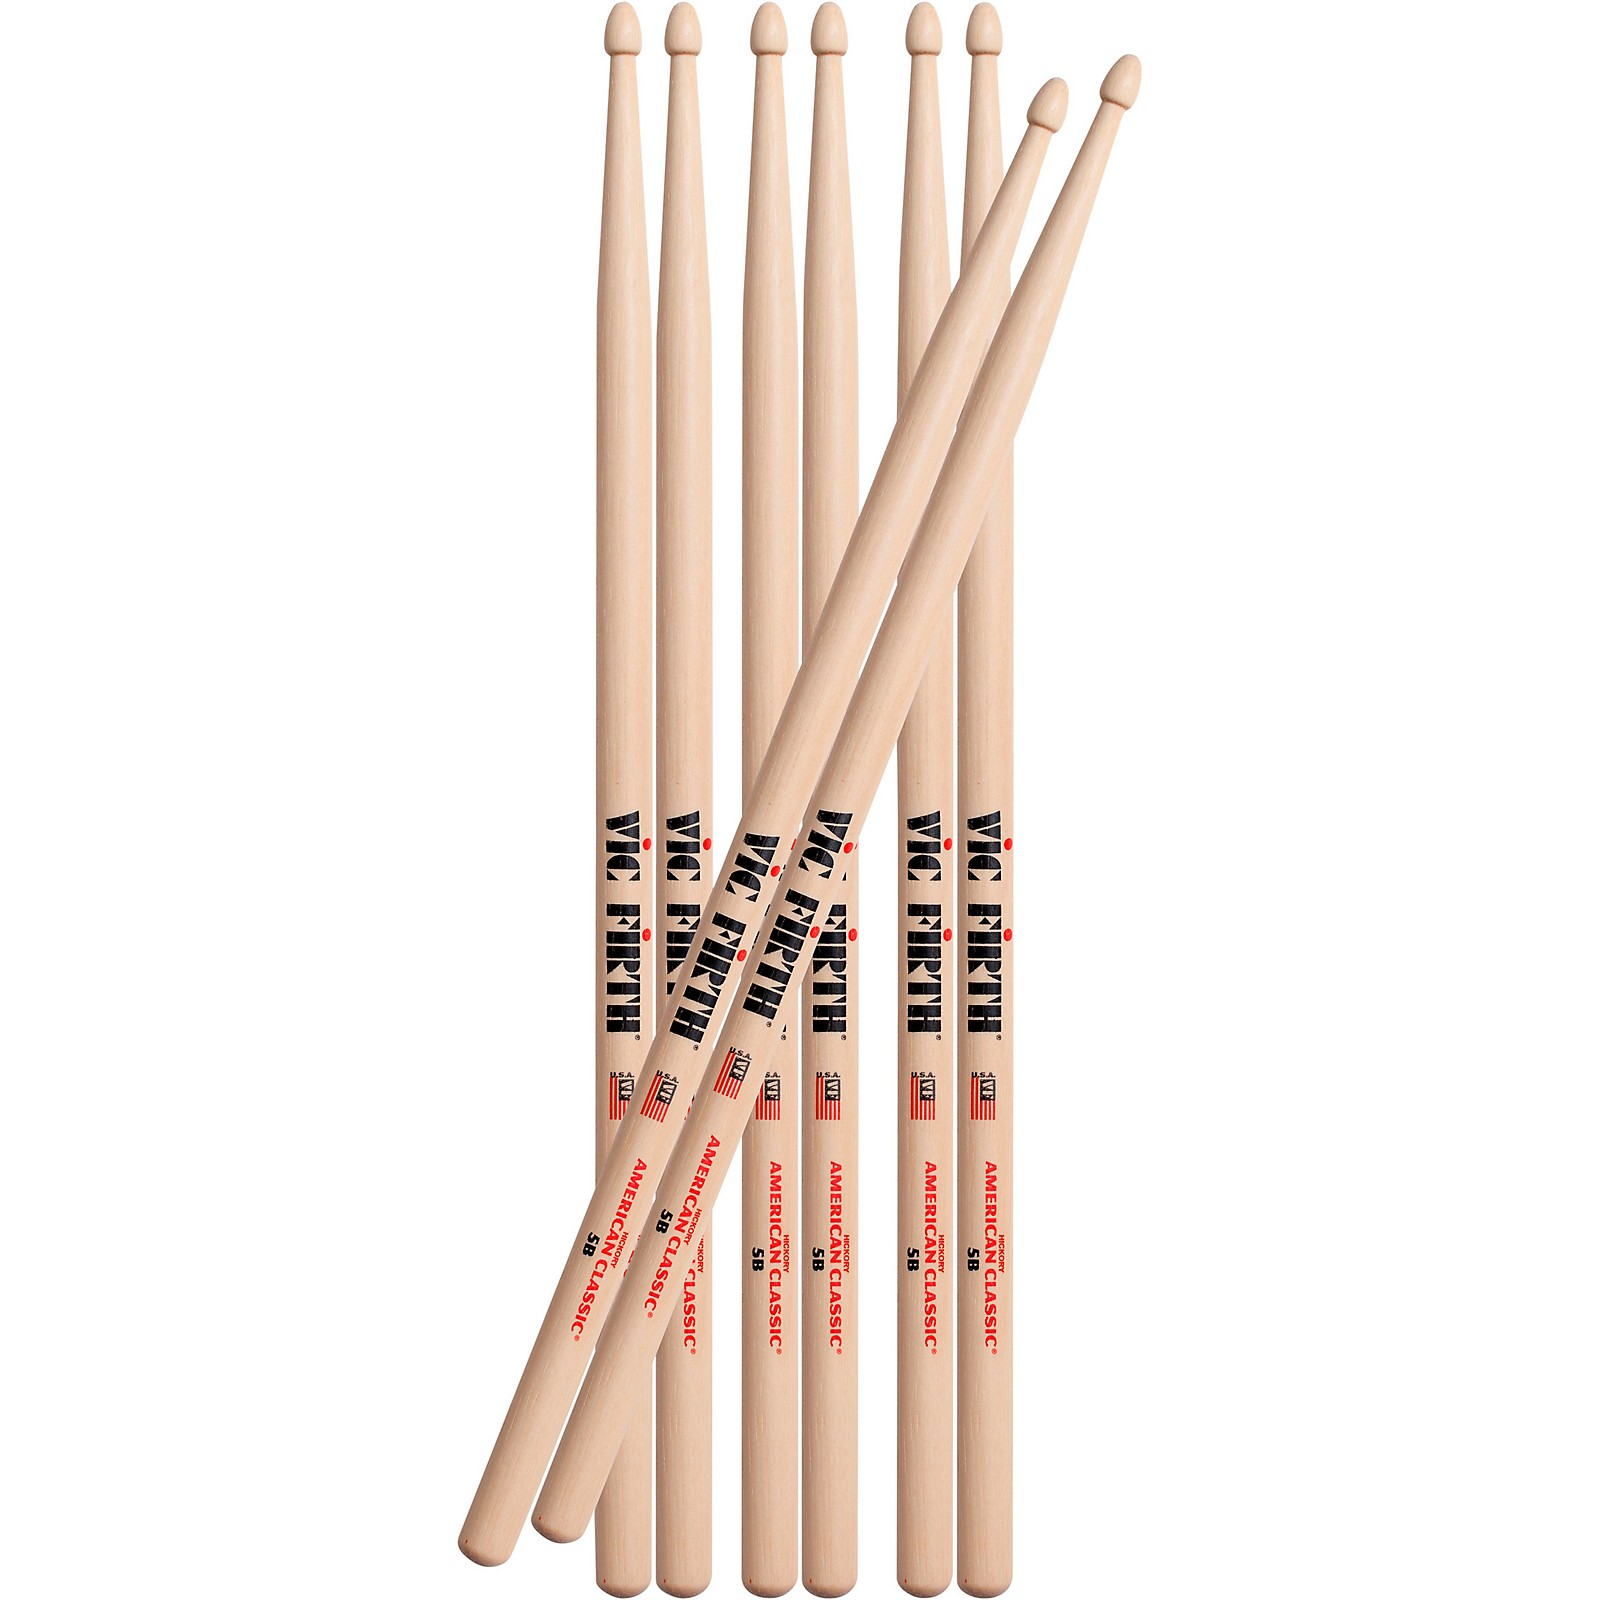 Vic Firth Buy 3 Pair of 5B Sticks, Get 1 Pair Free